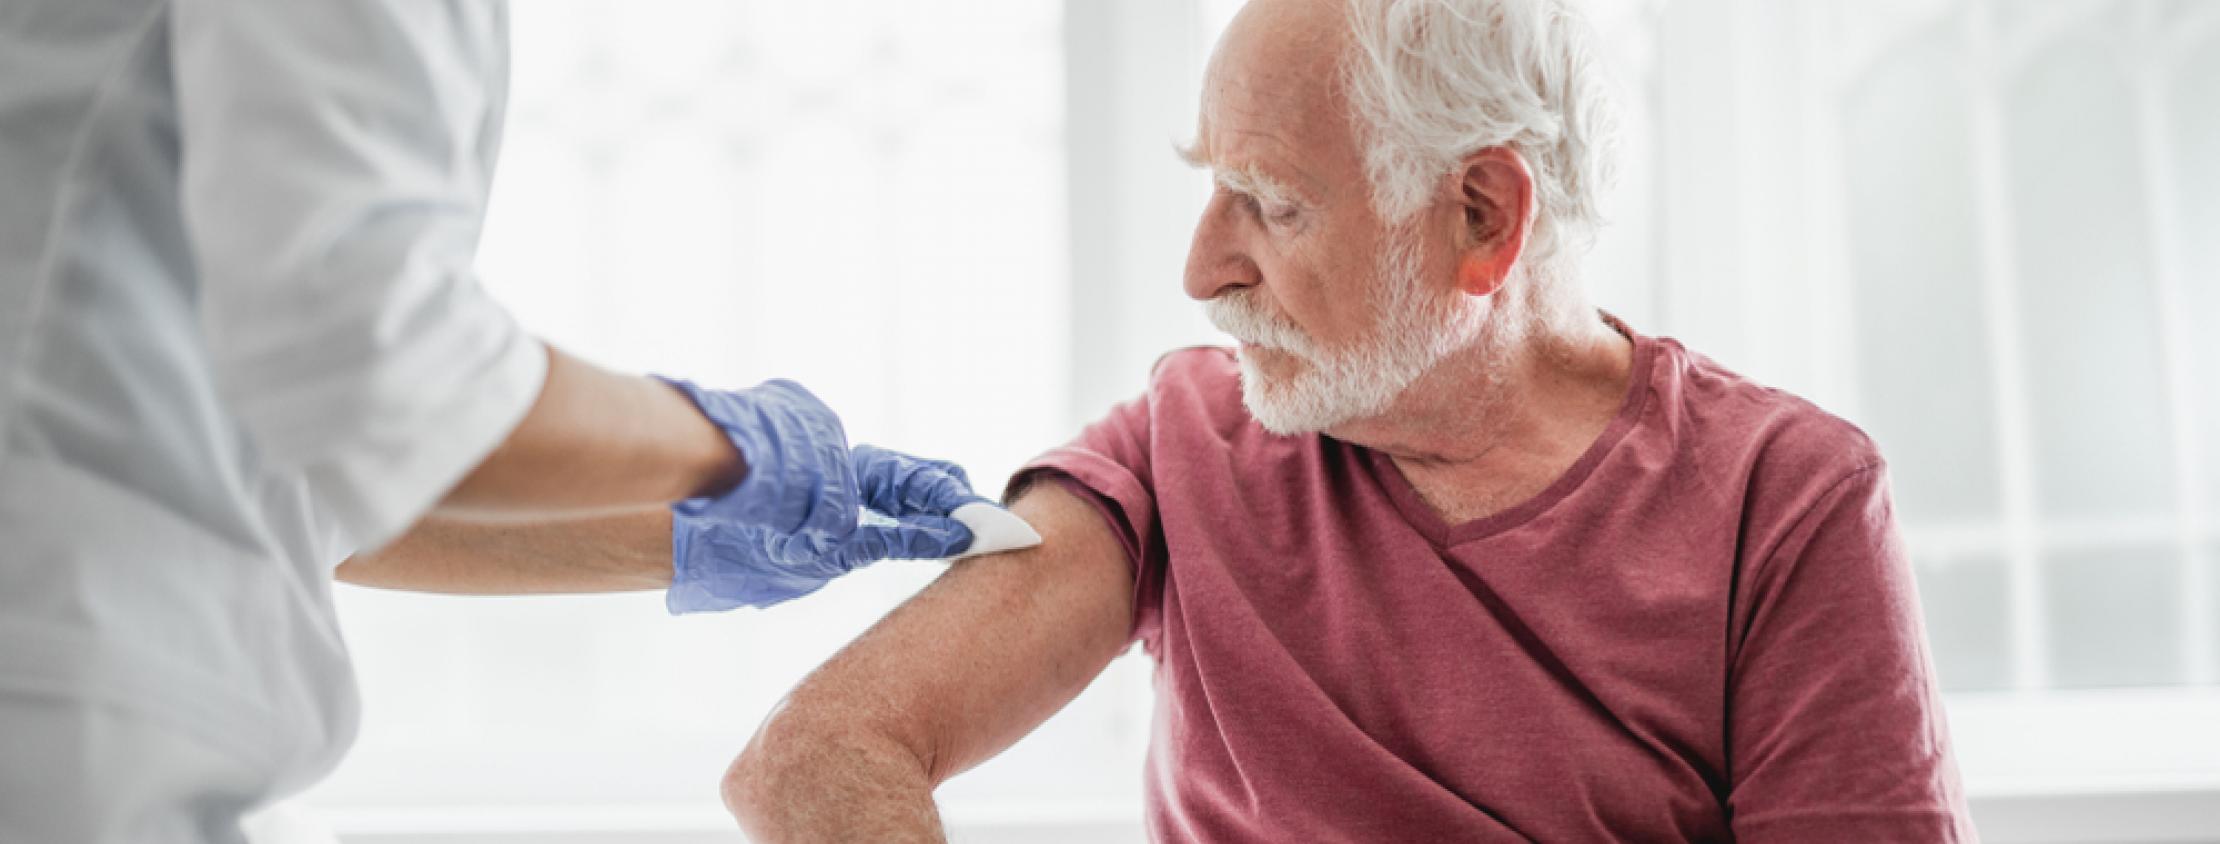 Argumente Impfgegner